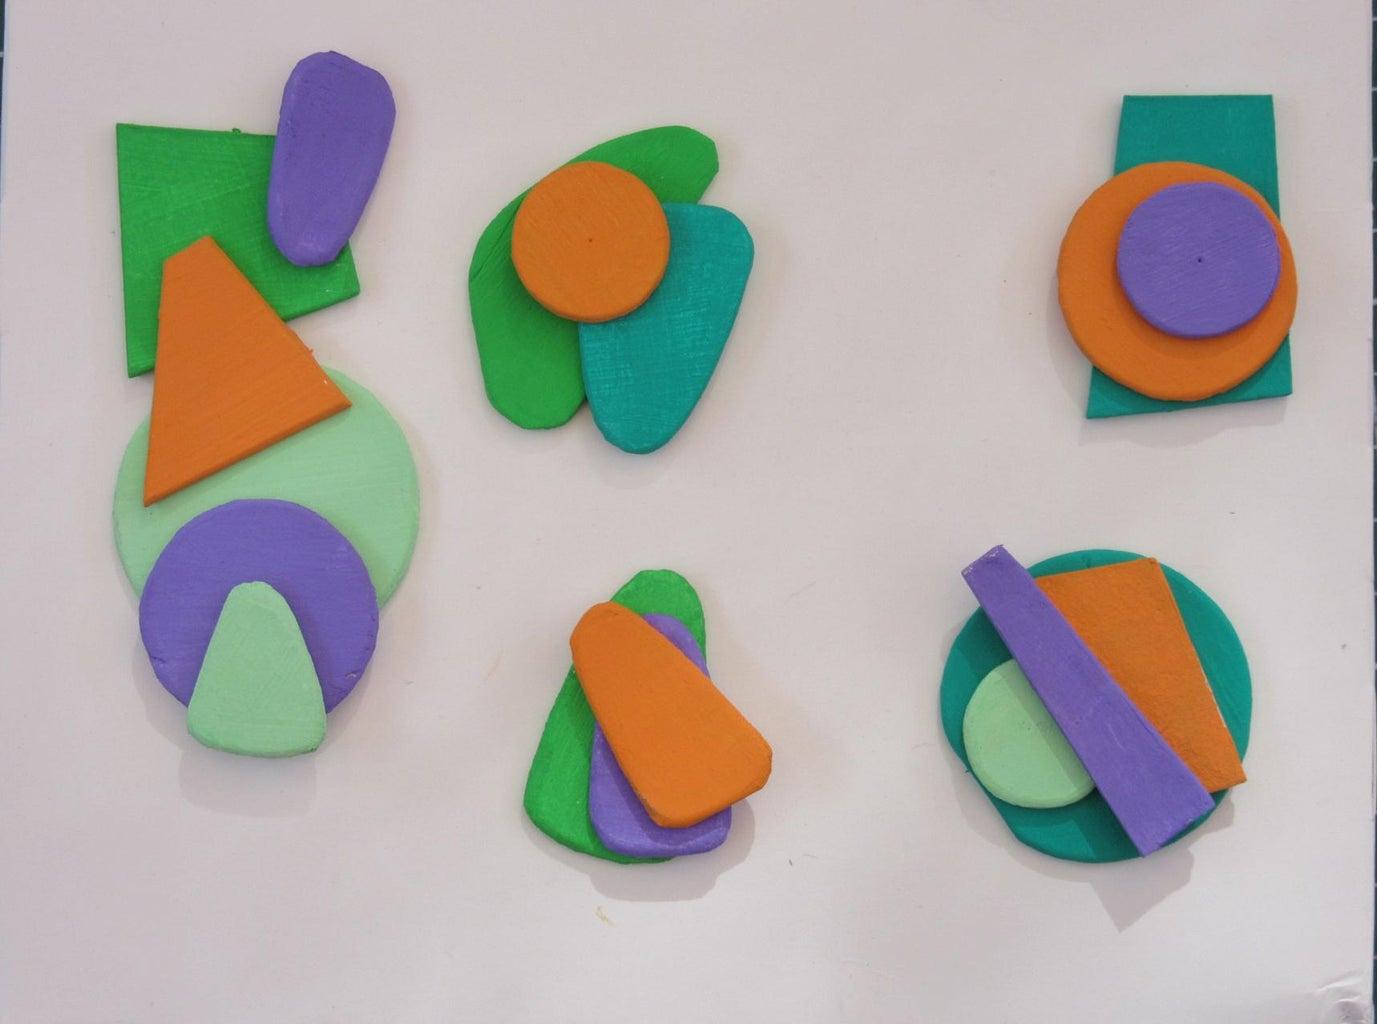 Assembling the Colors Harmonies